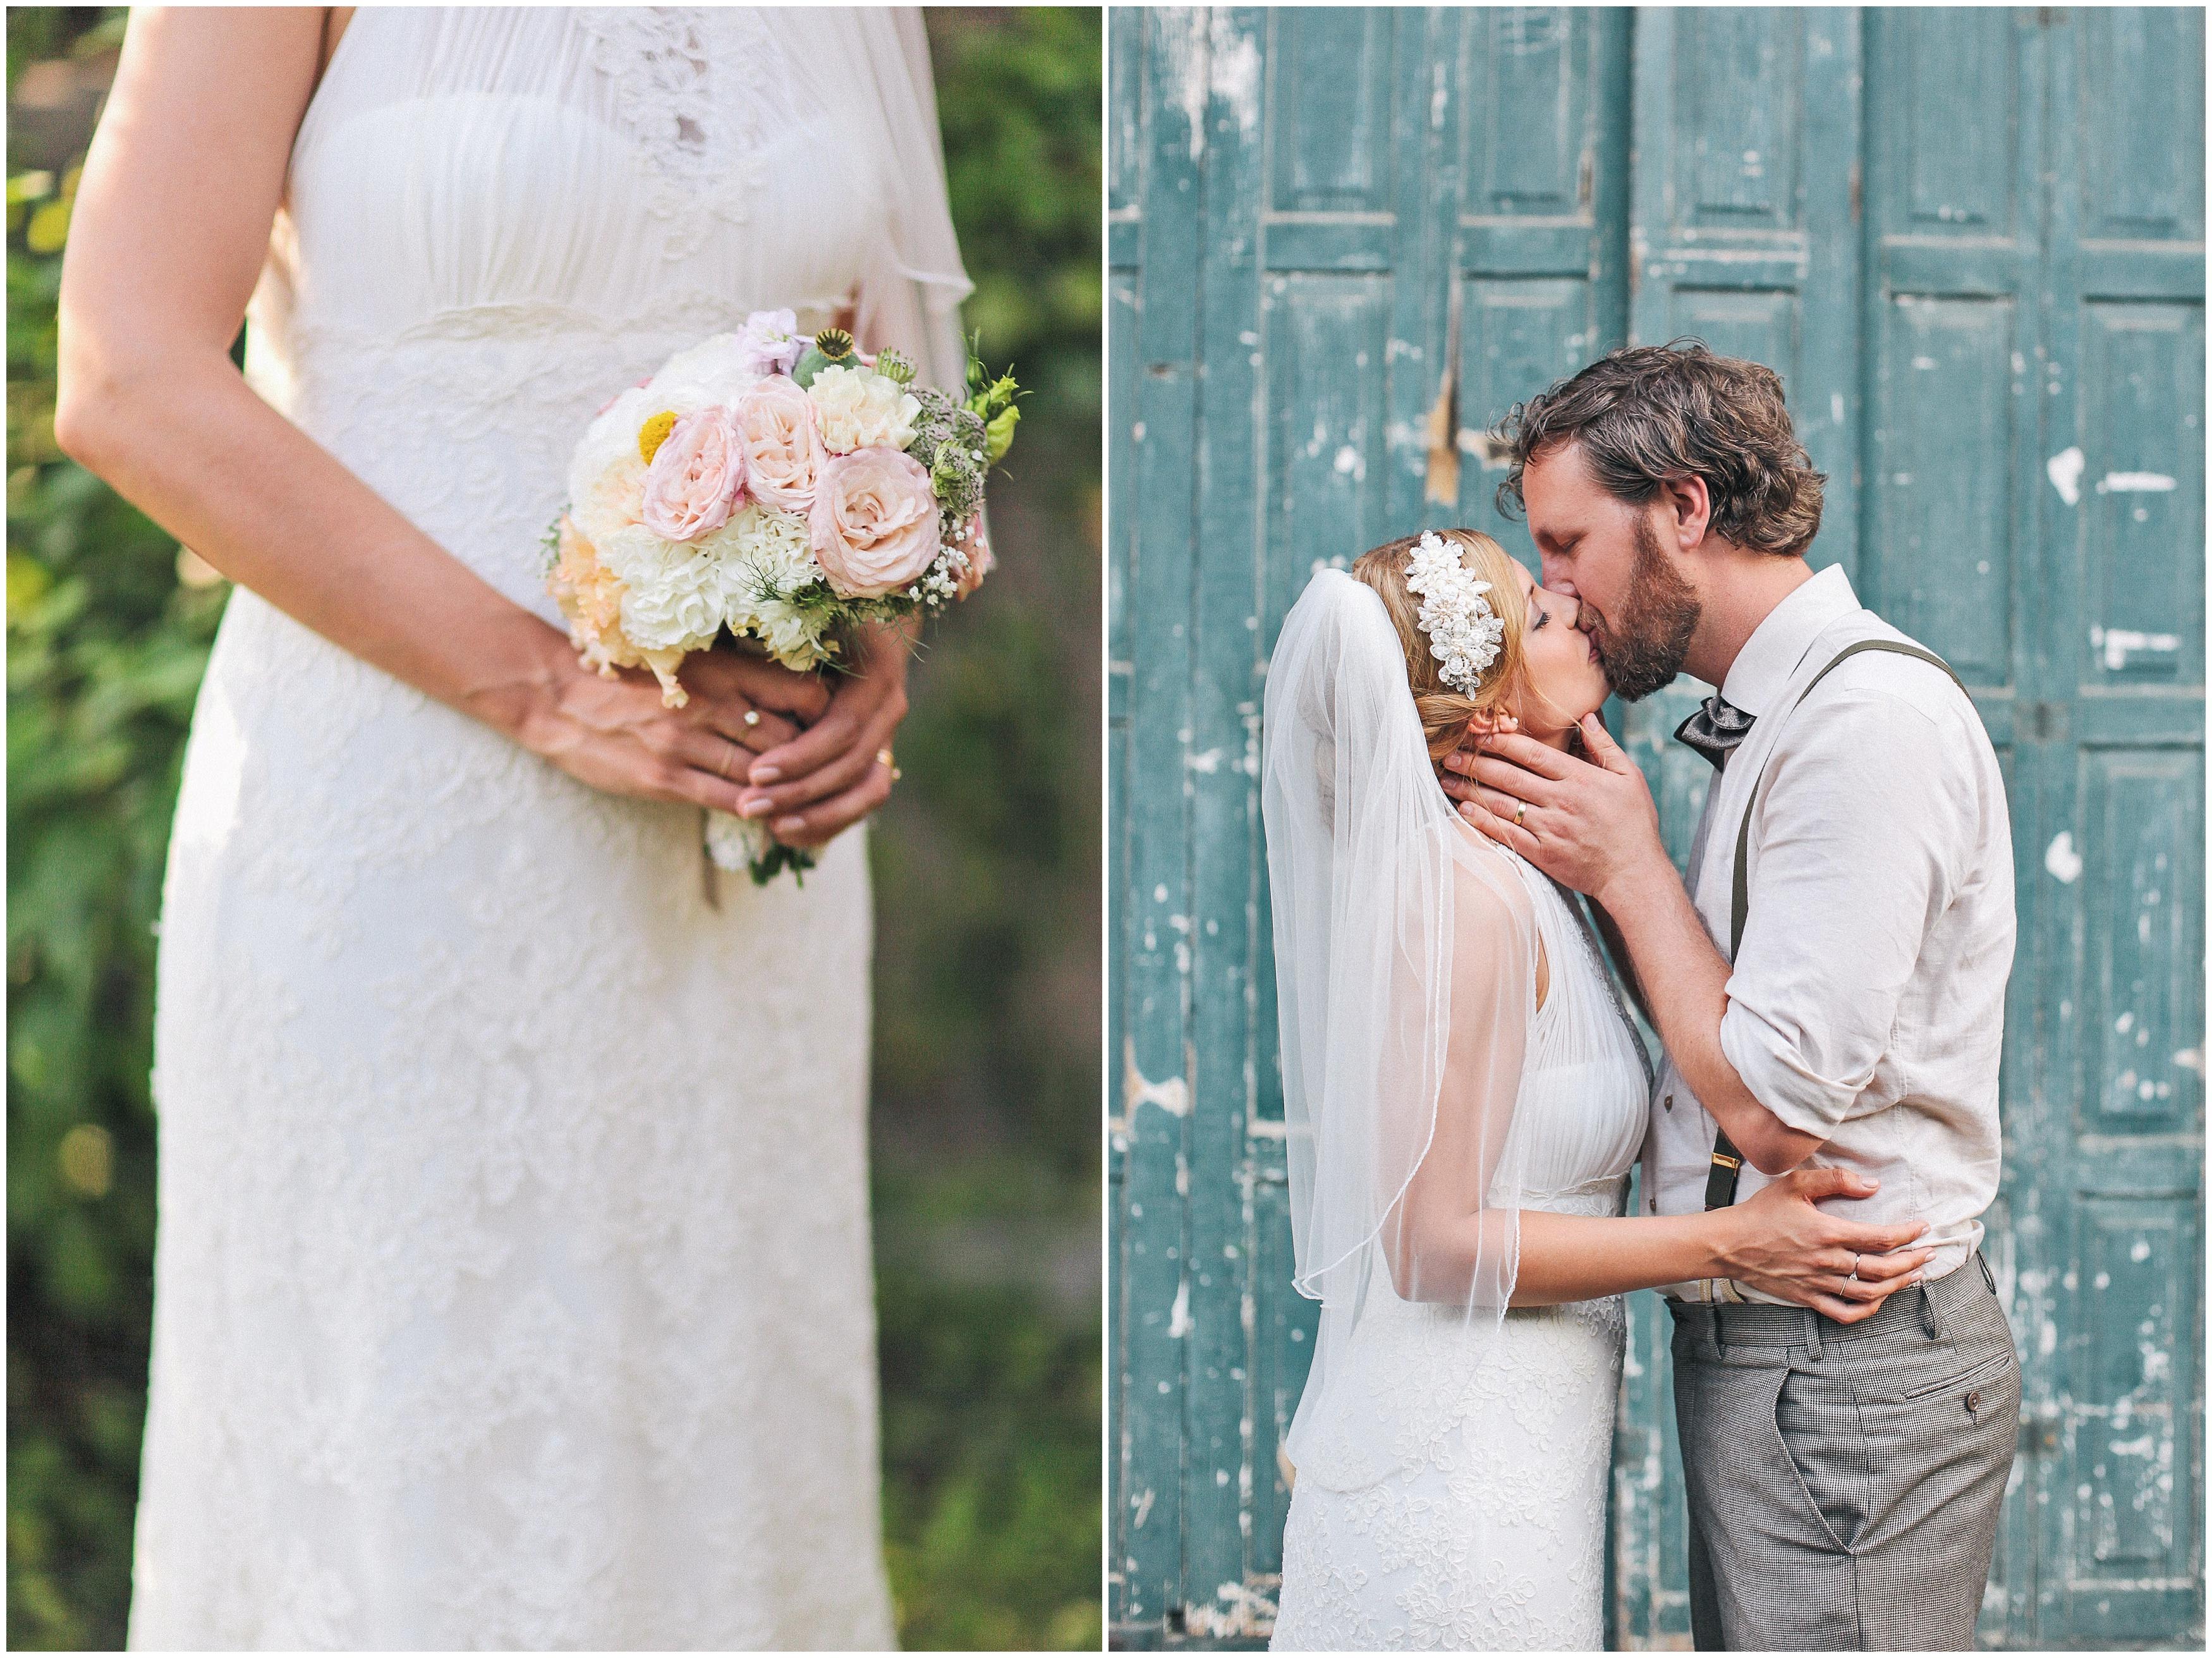 ivy&olive_Hochzeitsplanung_Nancy_Ebert_Fotografie_Vintage_Wedding_0019